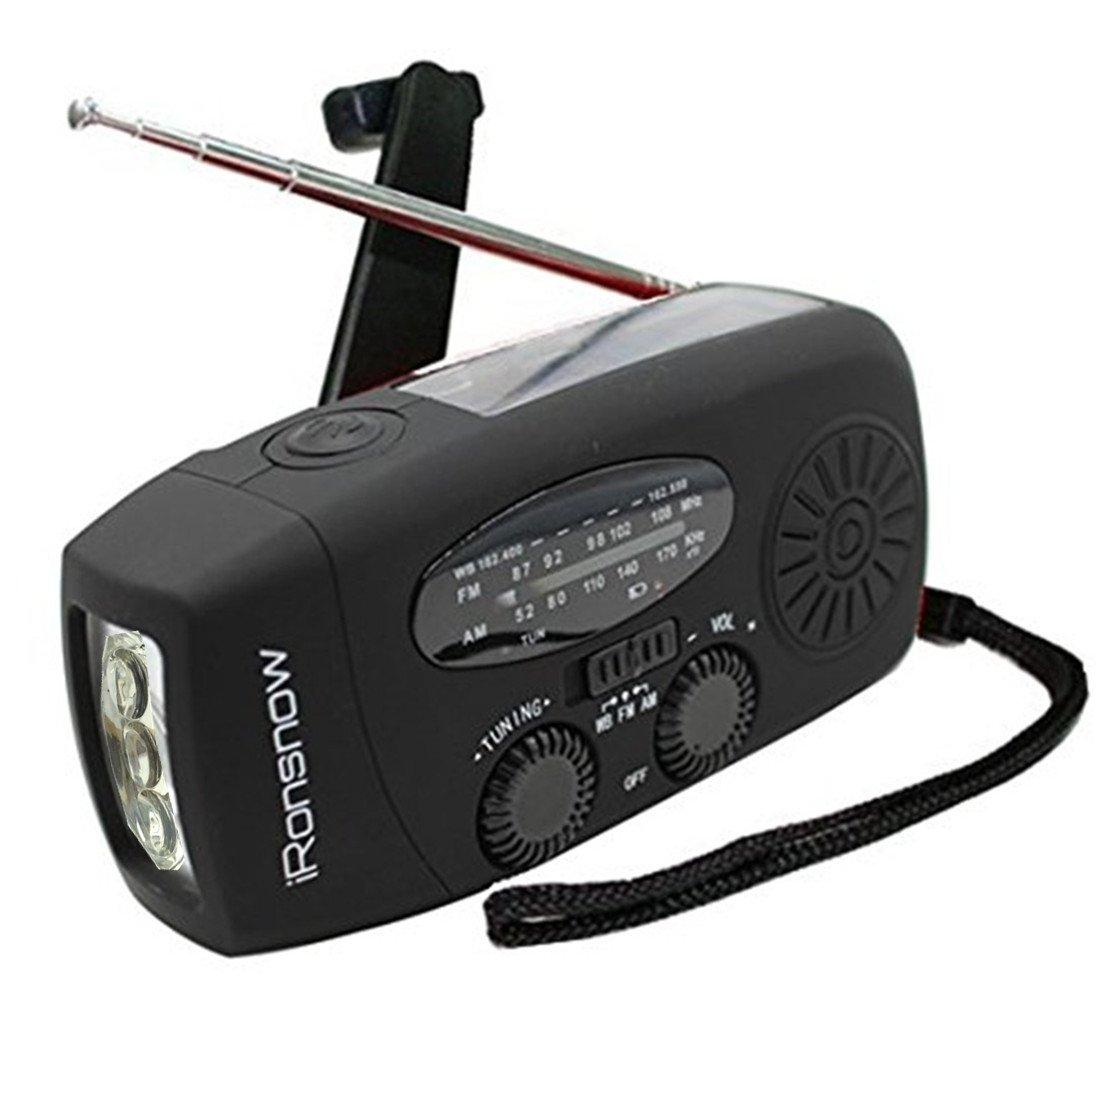 (Classic Creator) iRonsnow Solar Emergency NOAA Weather Radio Dynamo Hand Crank Self Powered AM FM WB Radios 3 LED Flashlight 1000mAh Smart Phone Charger Power Bank(Black)